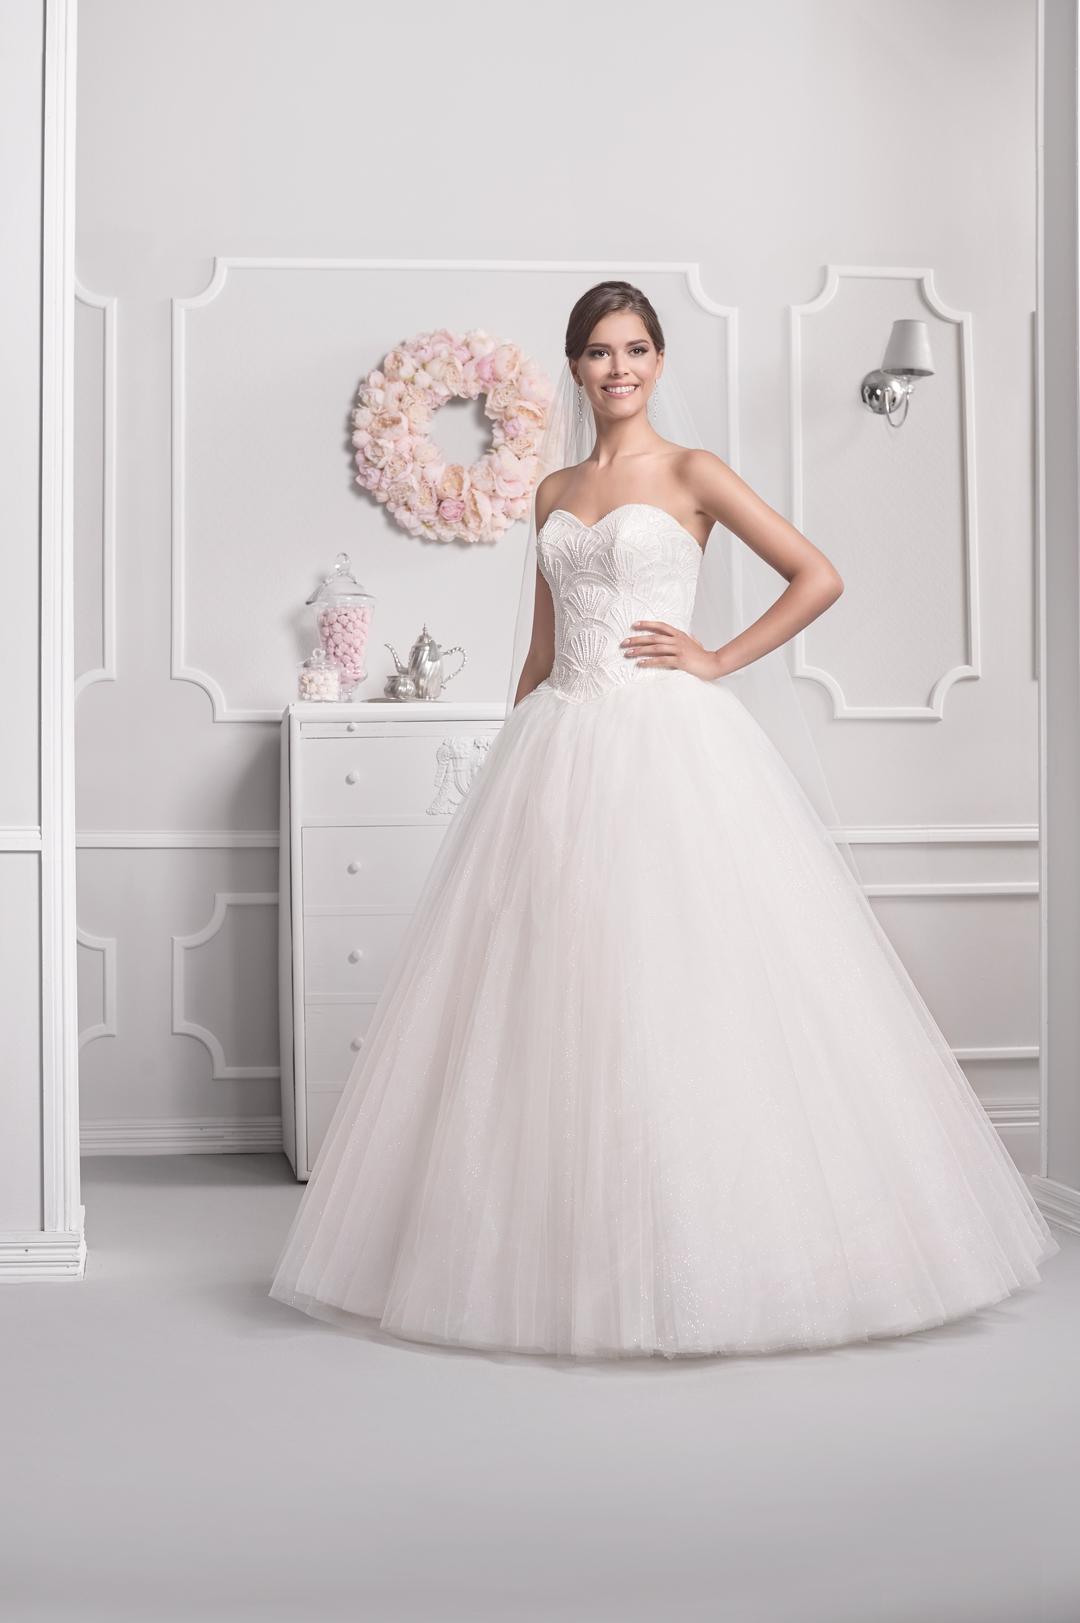 Hochzeitskleid Agnes Bridal Dream KA-18029